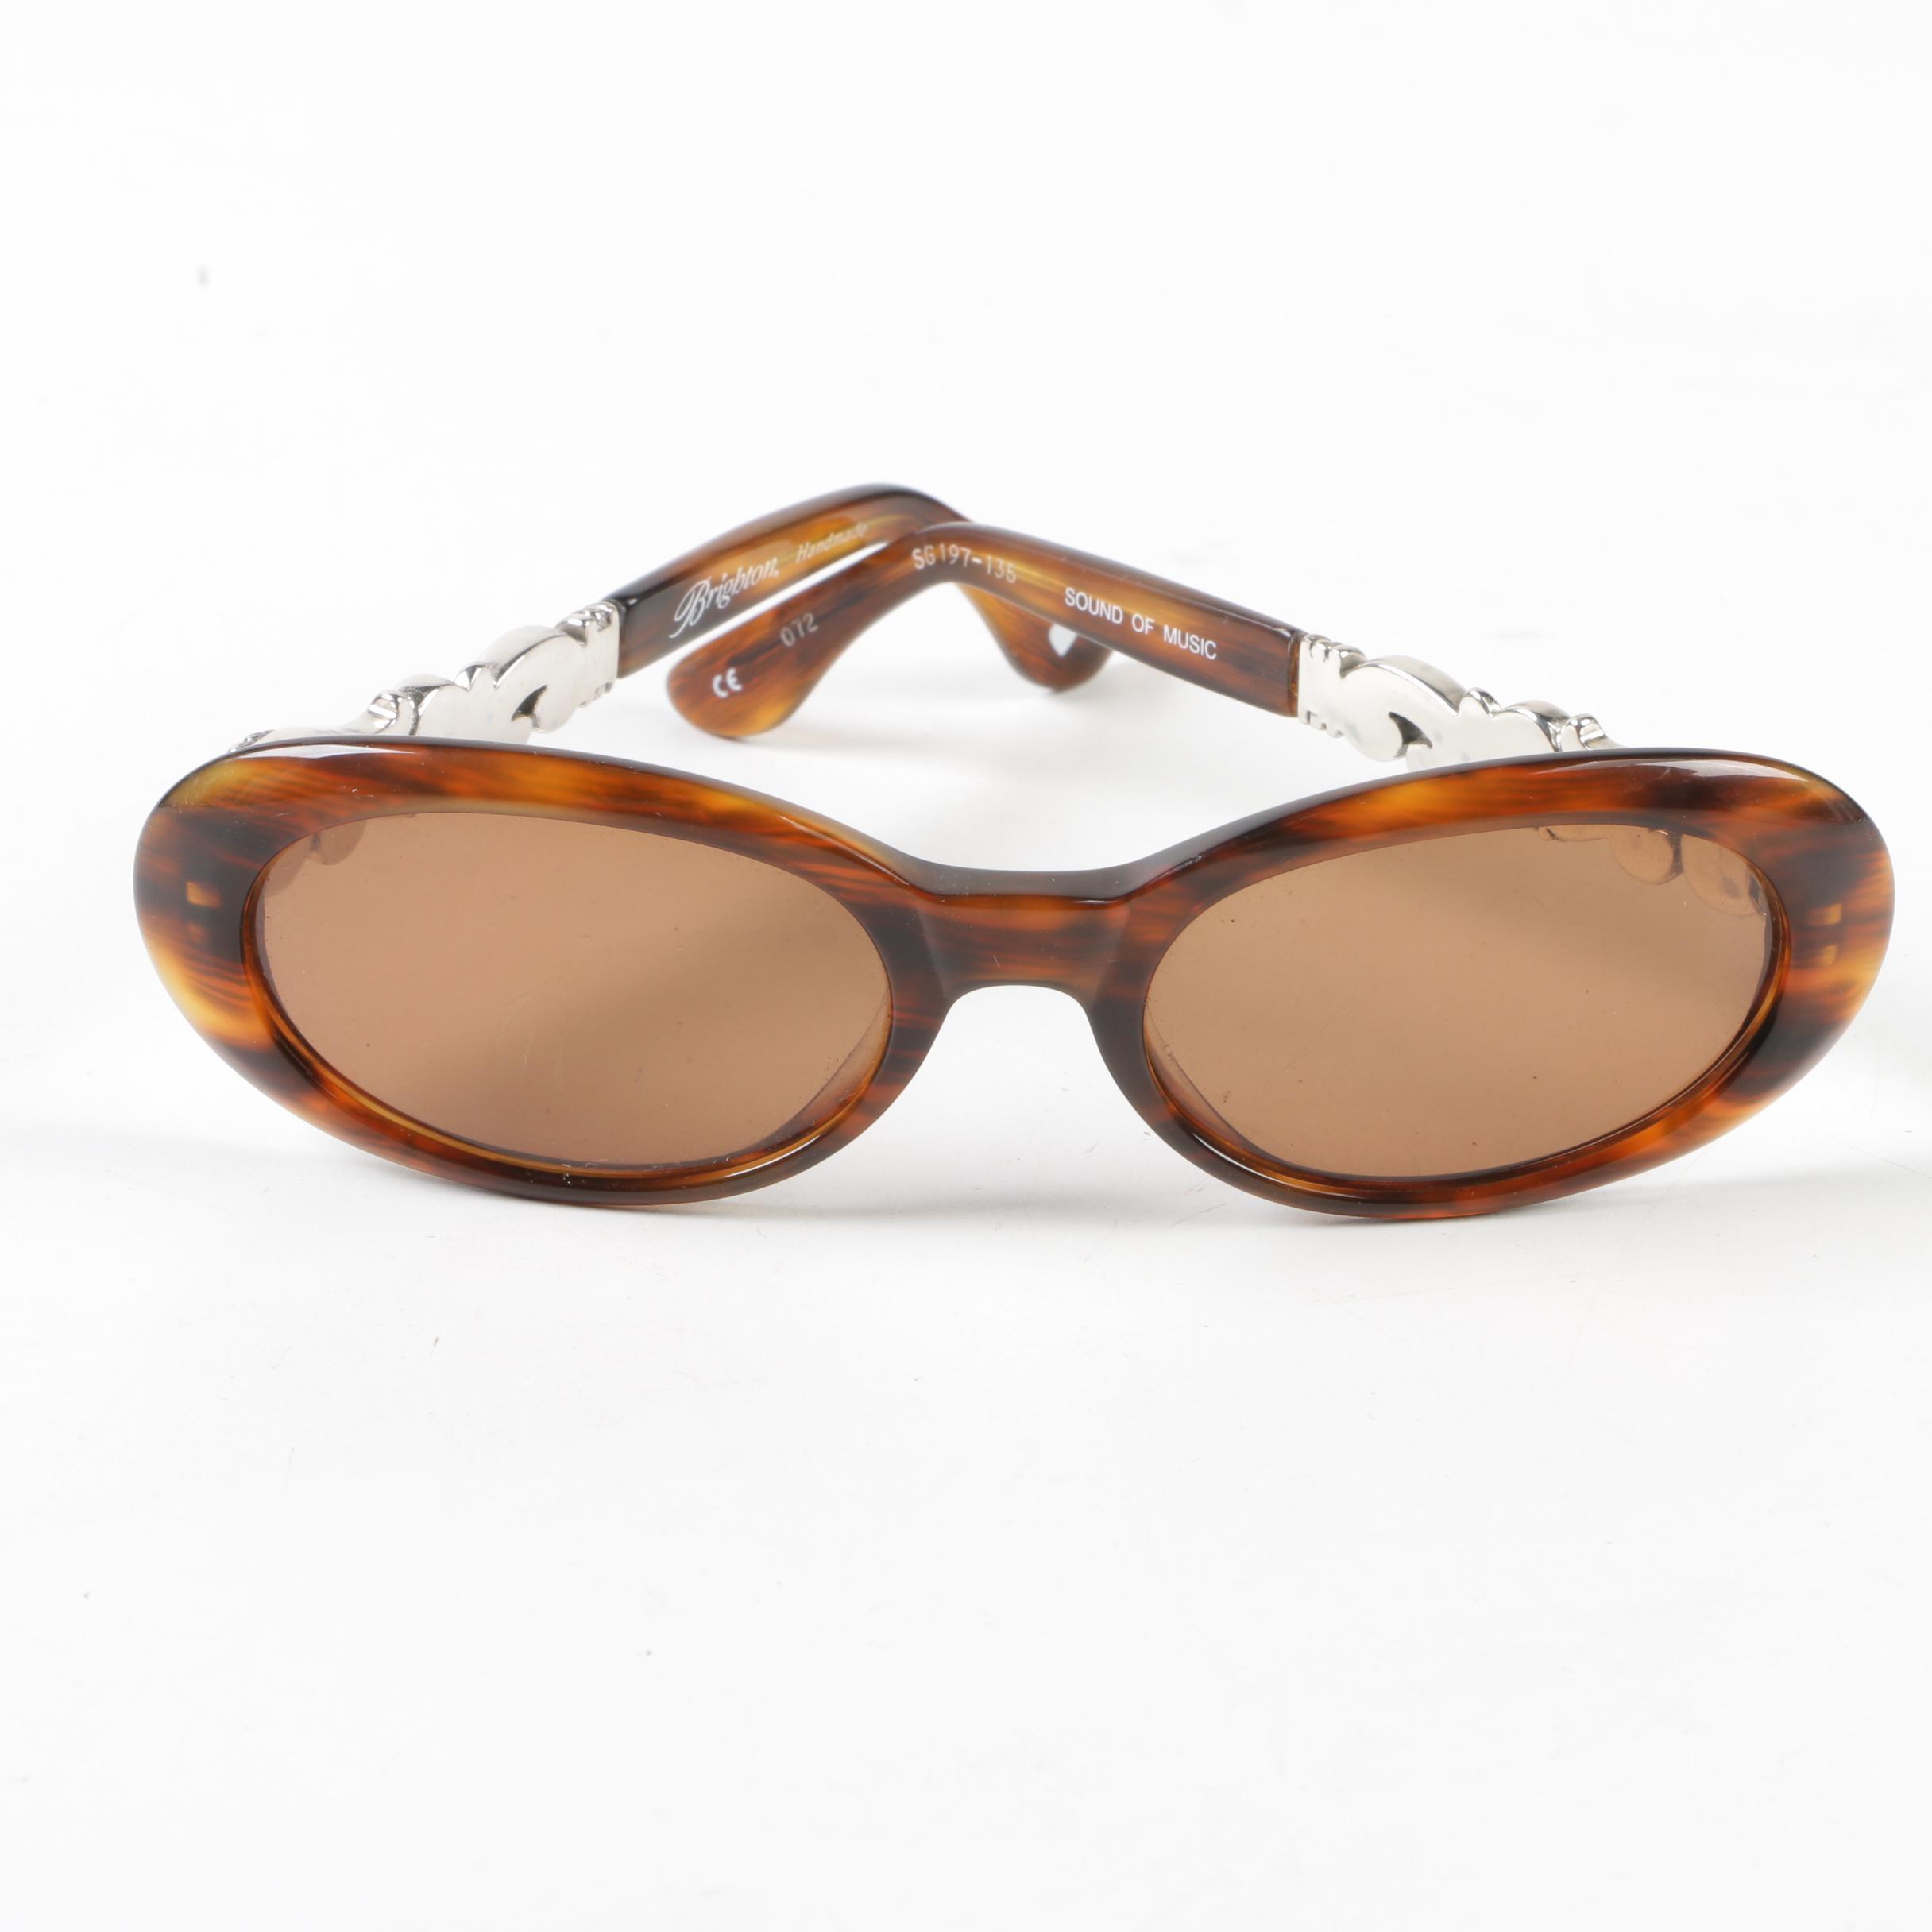 Brighton Sound of Music Sunglasses with Case